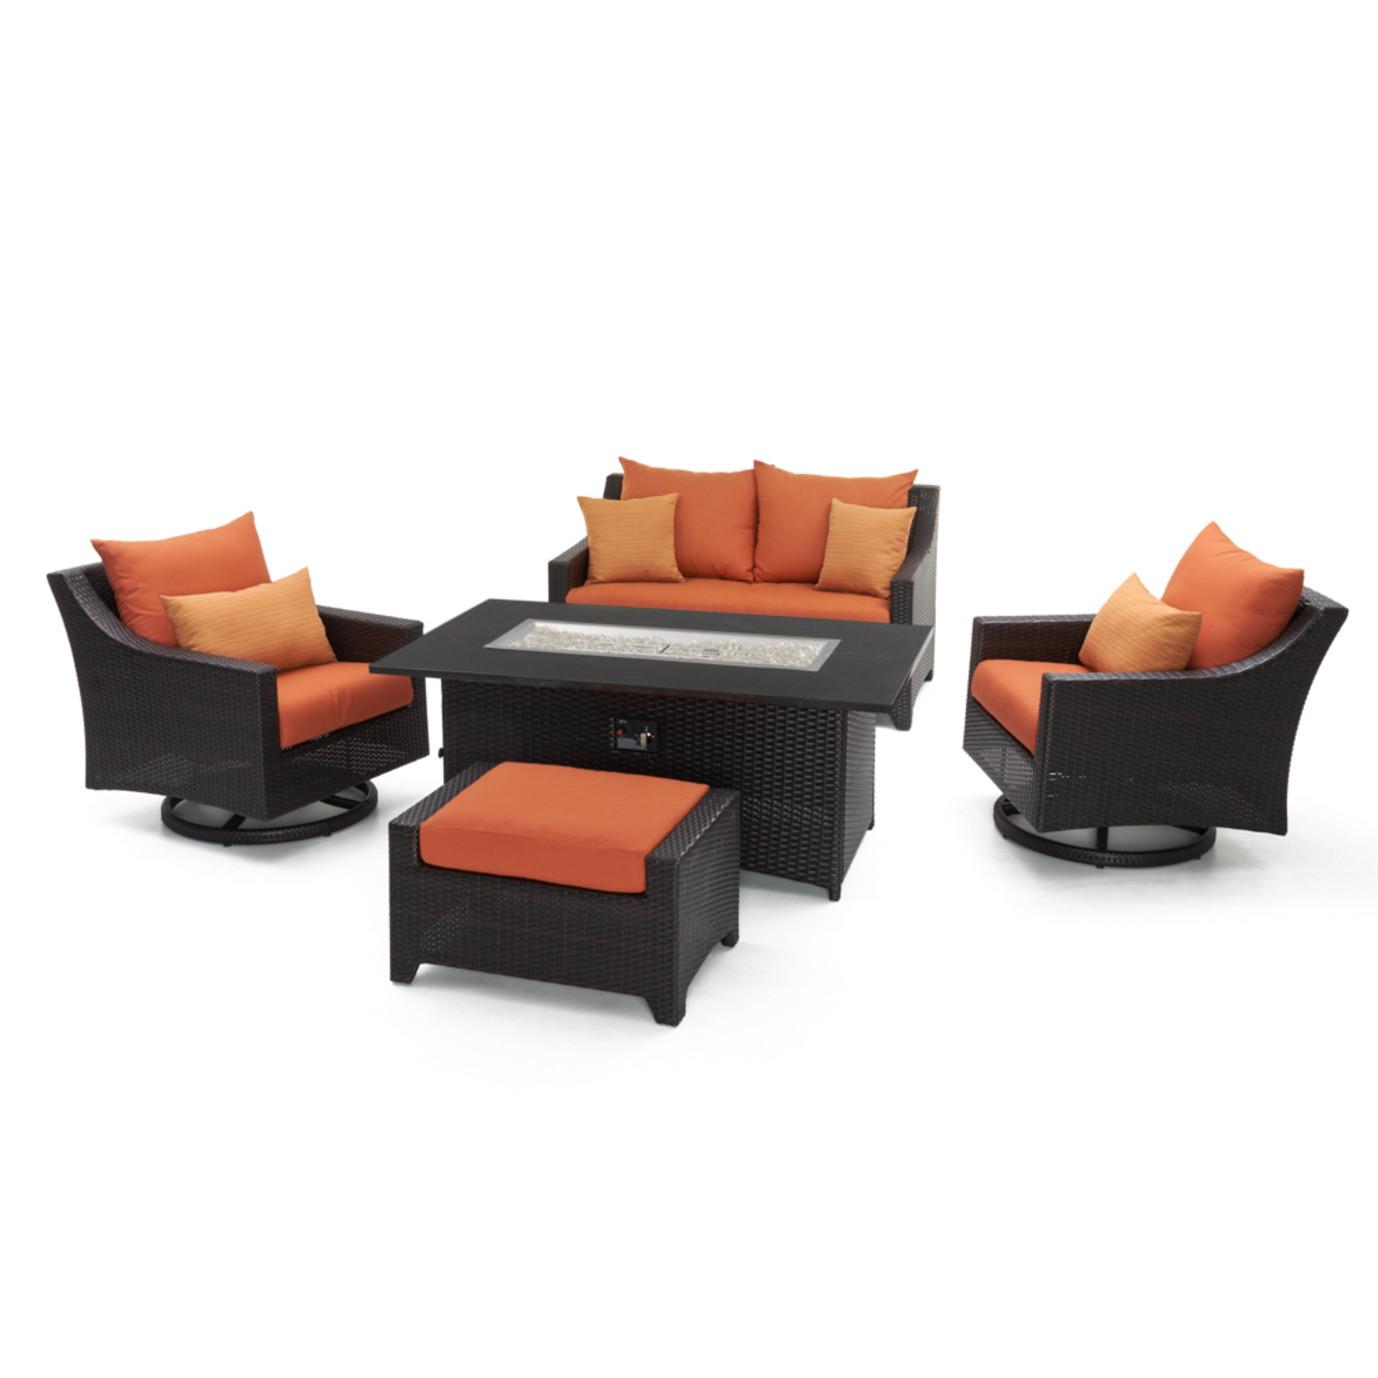 Deco™ 5pc Love & Motion Club Fire Set - Tikka Orange